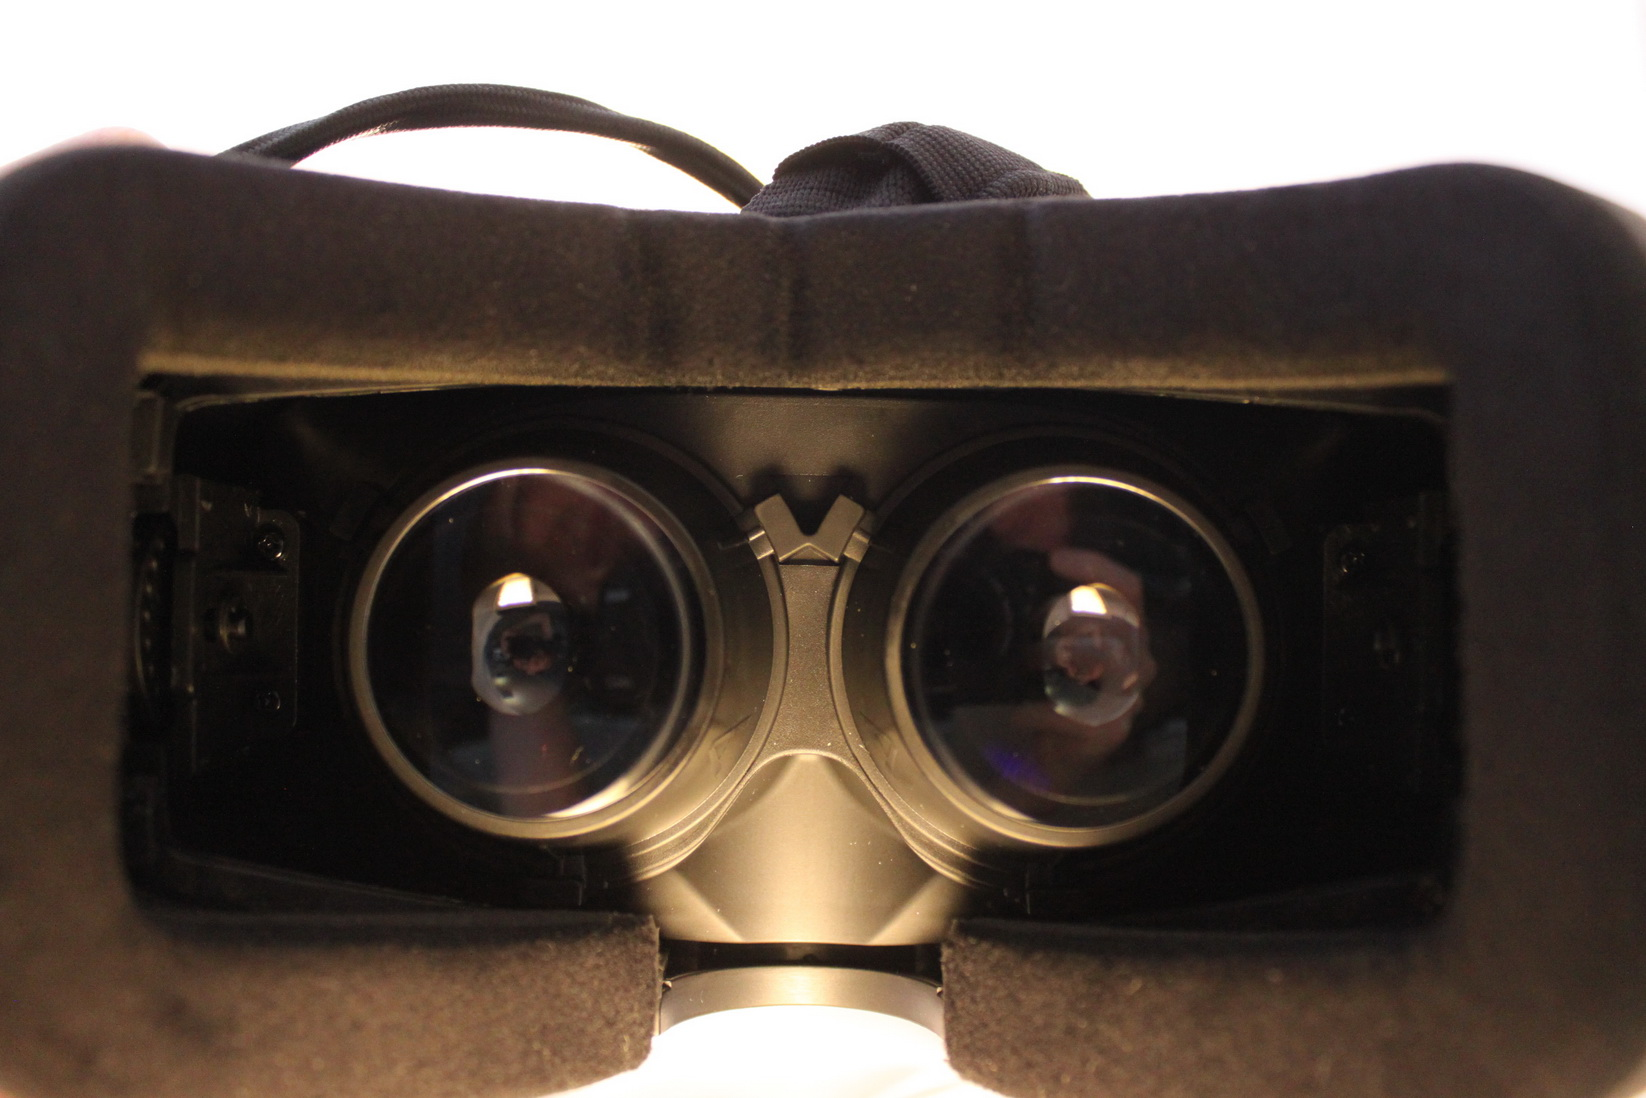 OculusRiftDK2 Gameblog 241